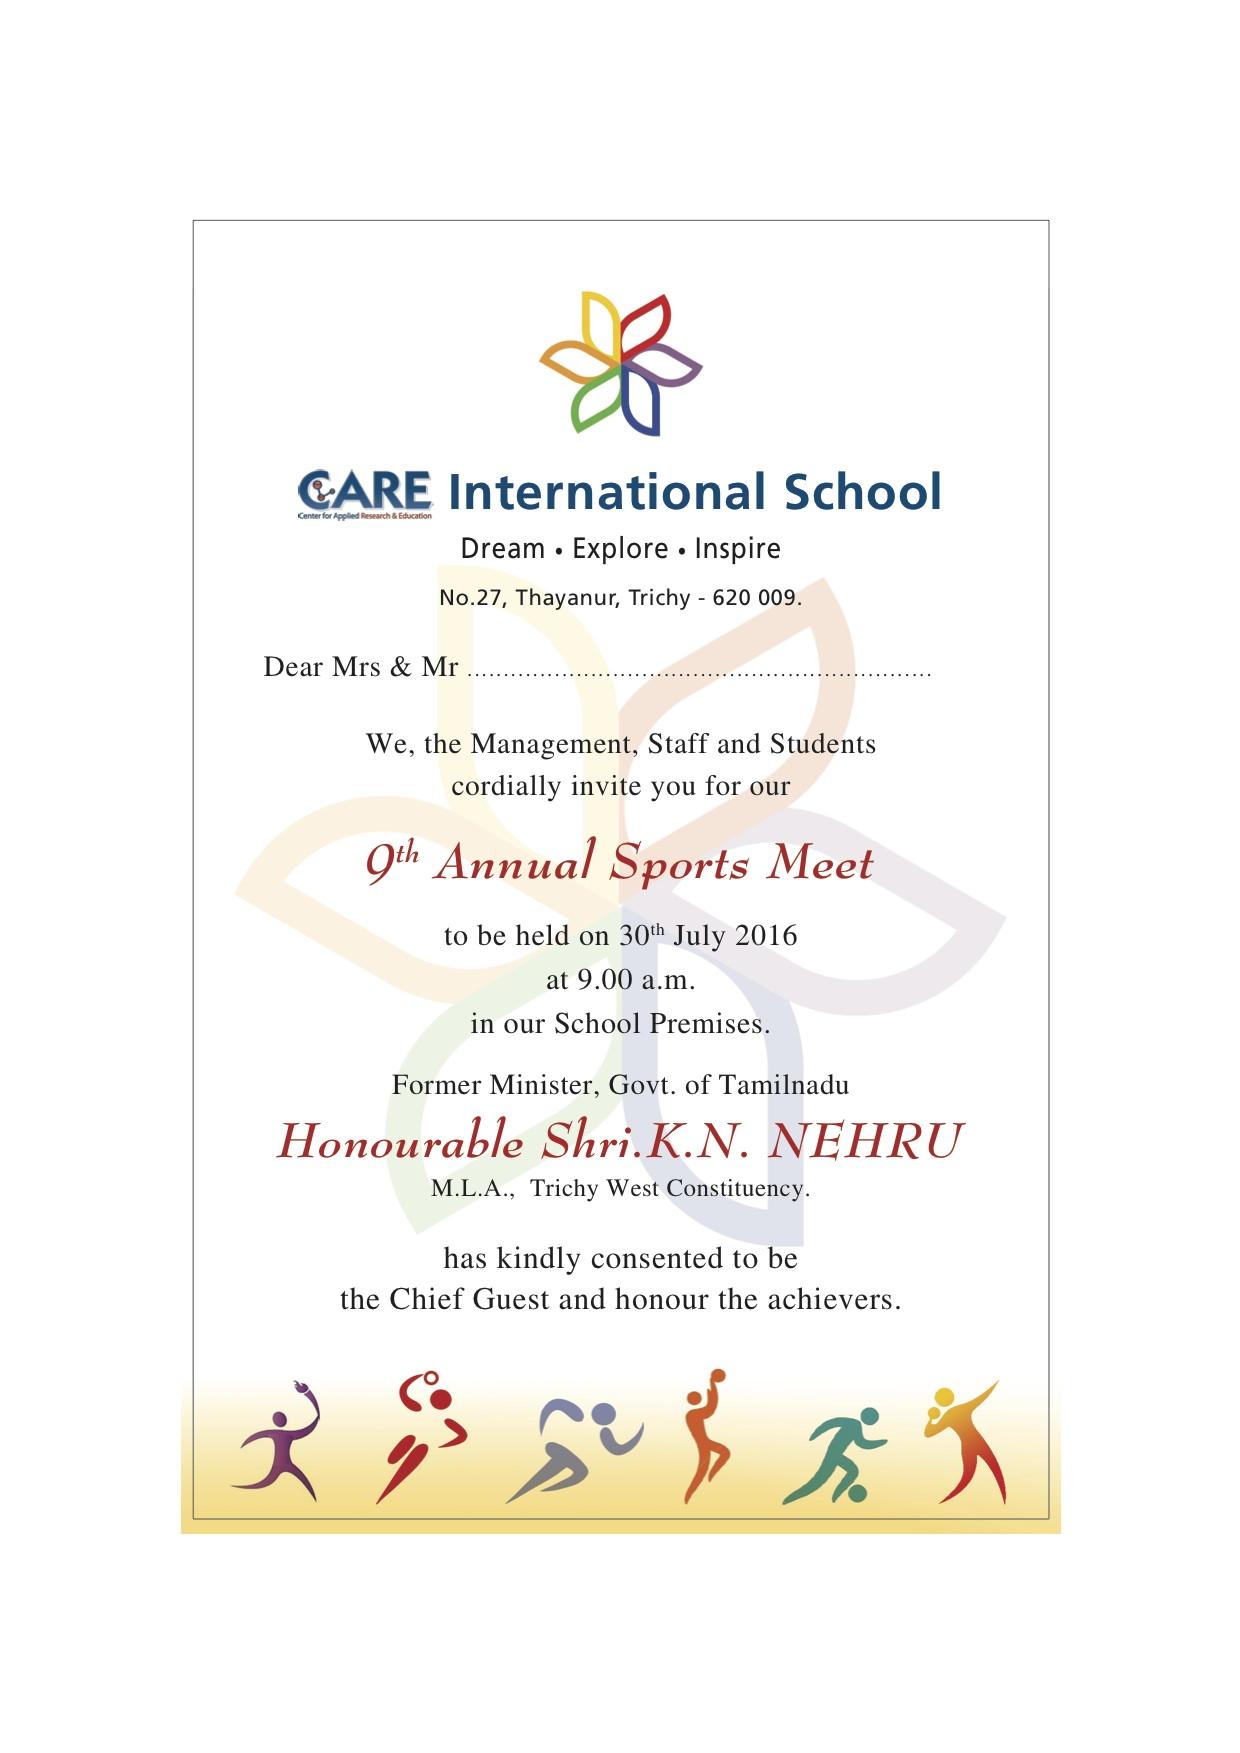 Annual Sports Meet Invite Care International School